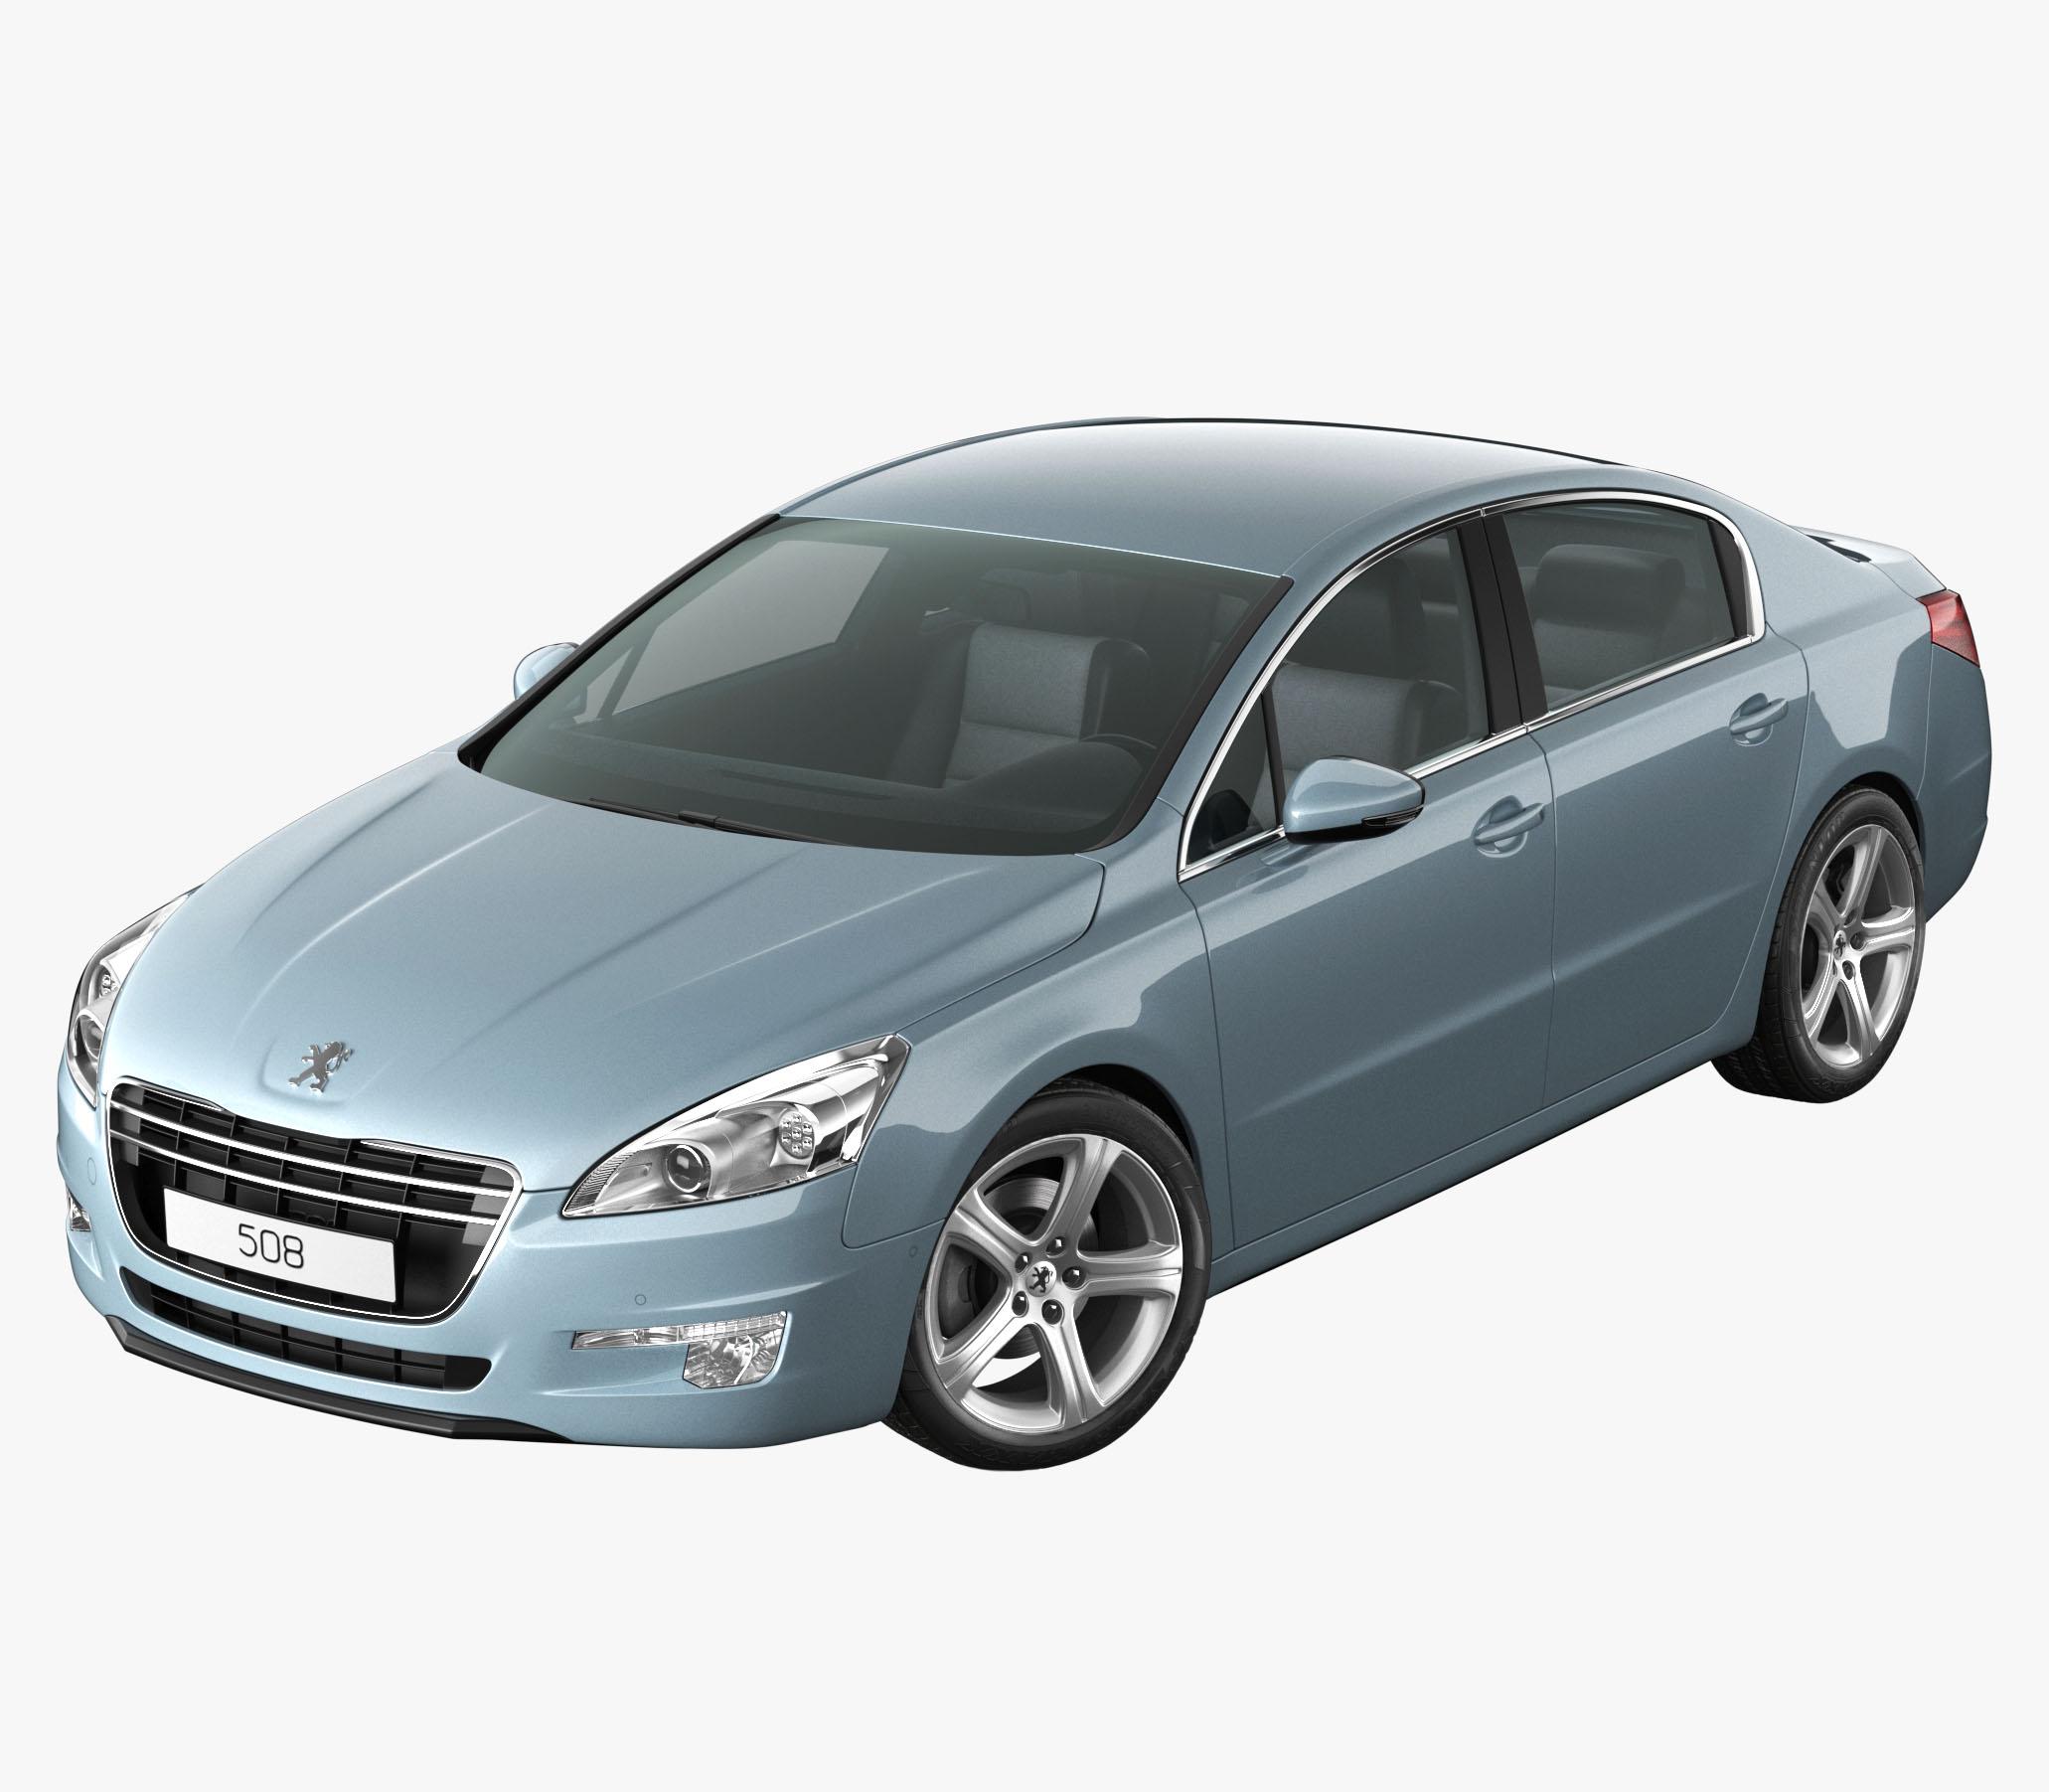 Peugeot 508 Blue 3D Model